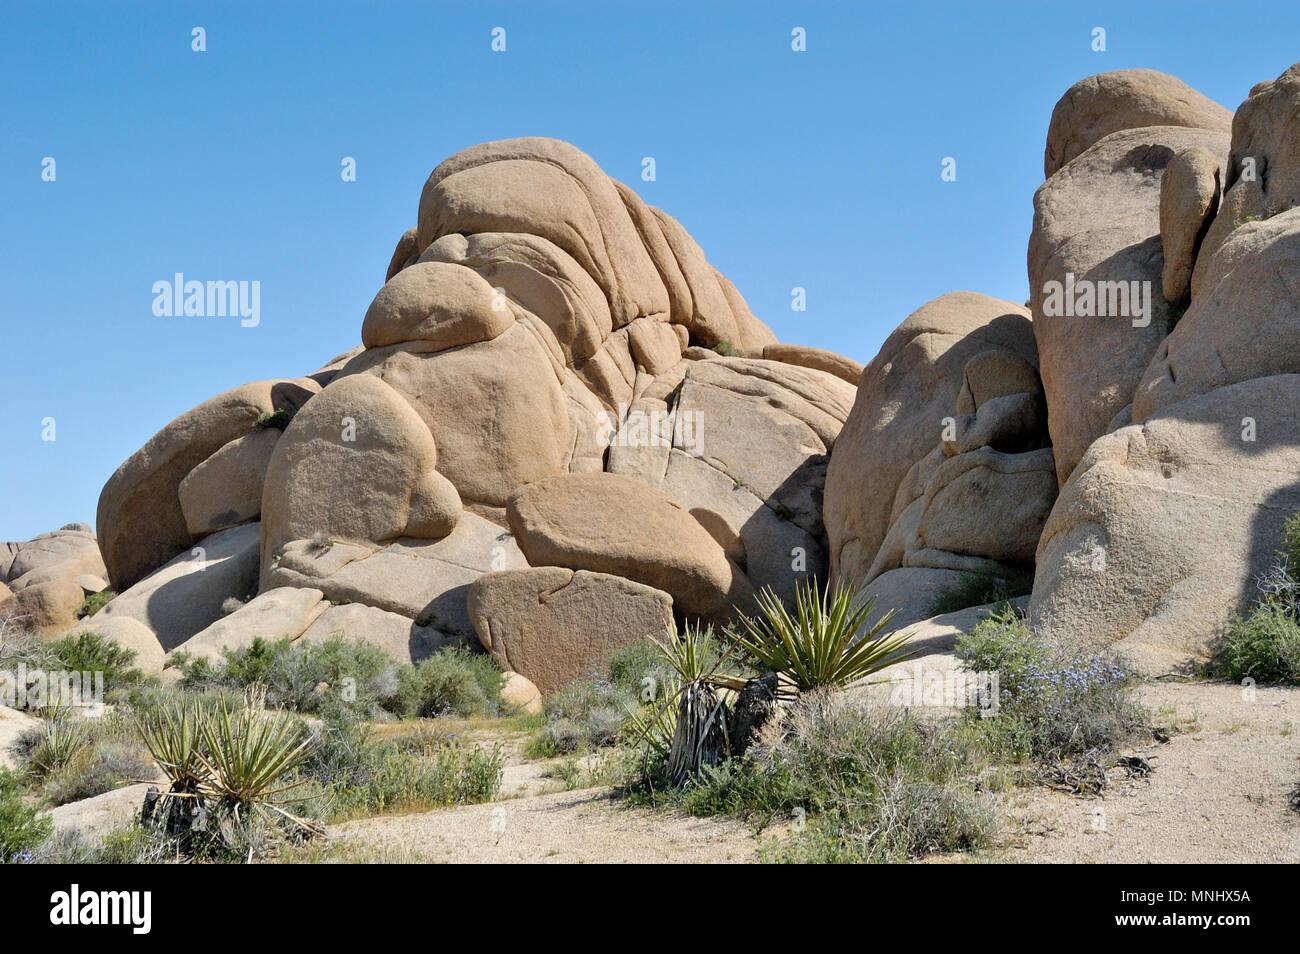 Indian Faced Rock, Monzogranite rock pile, Jumbo Rocks, Joshua Tree National Park, CA 040410_0704 - Stock Image